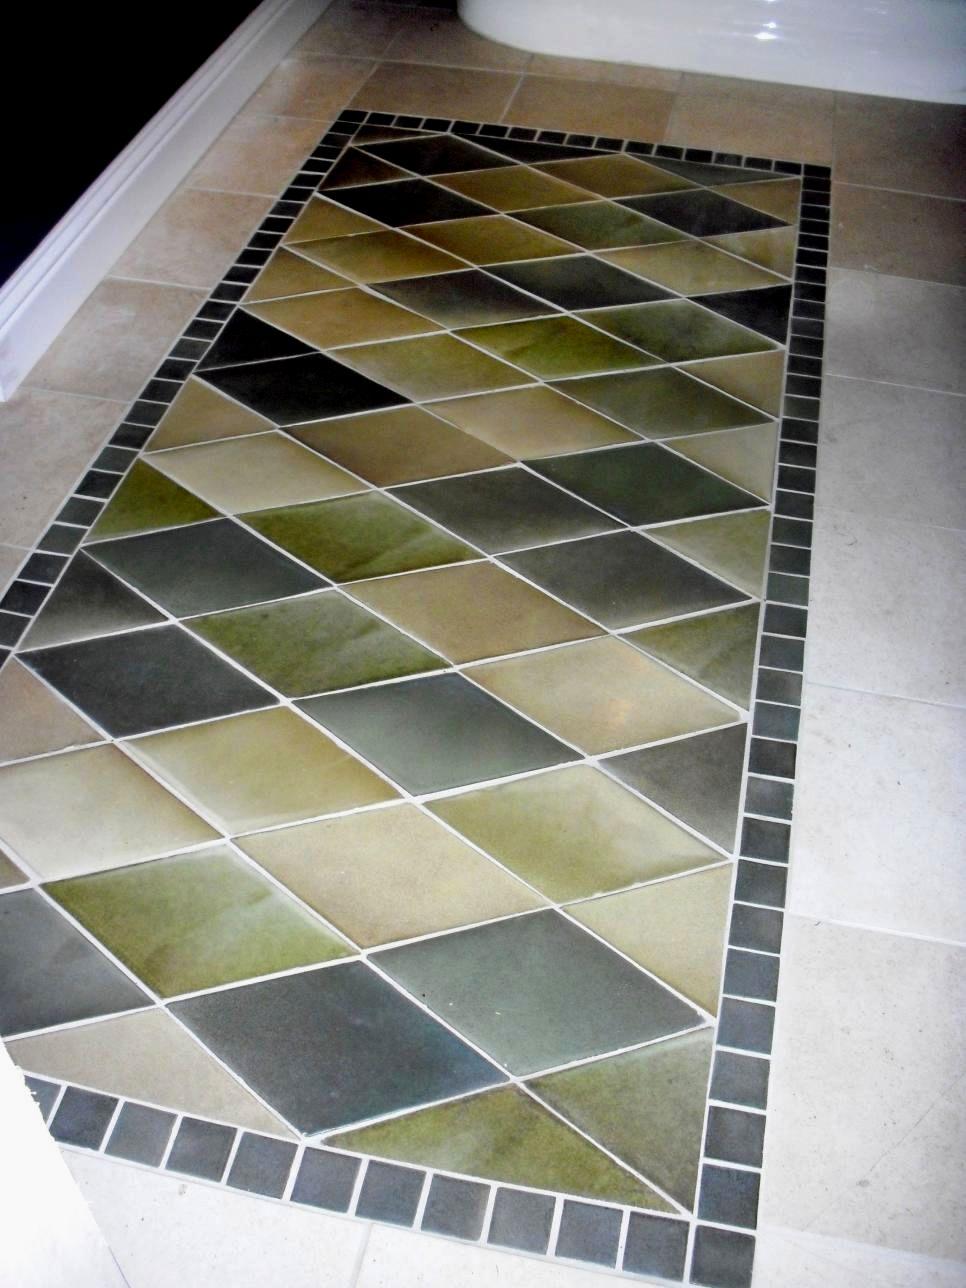 new small bathroom tiles design portrait-Contemporary Small Bathroom Tiles Design Architecture